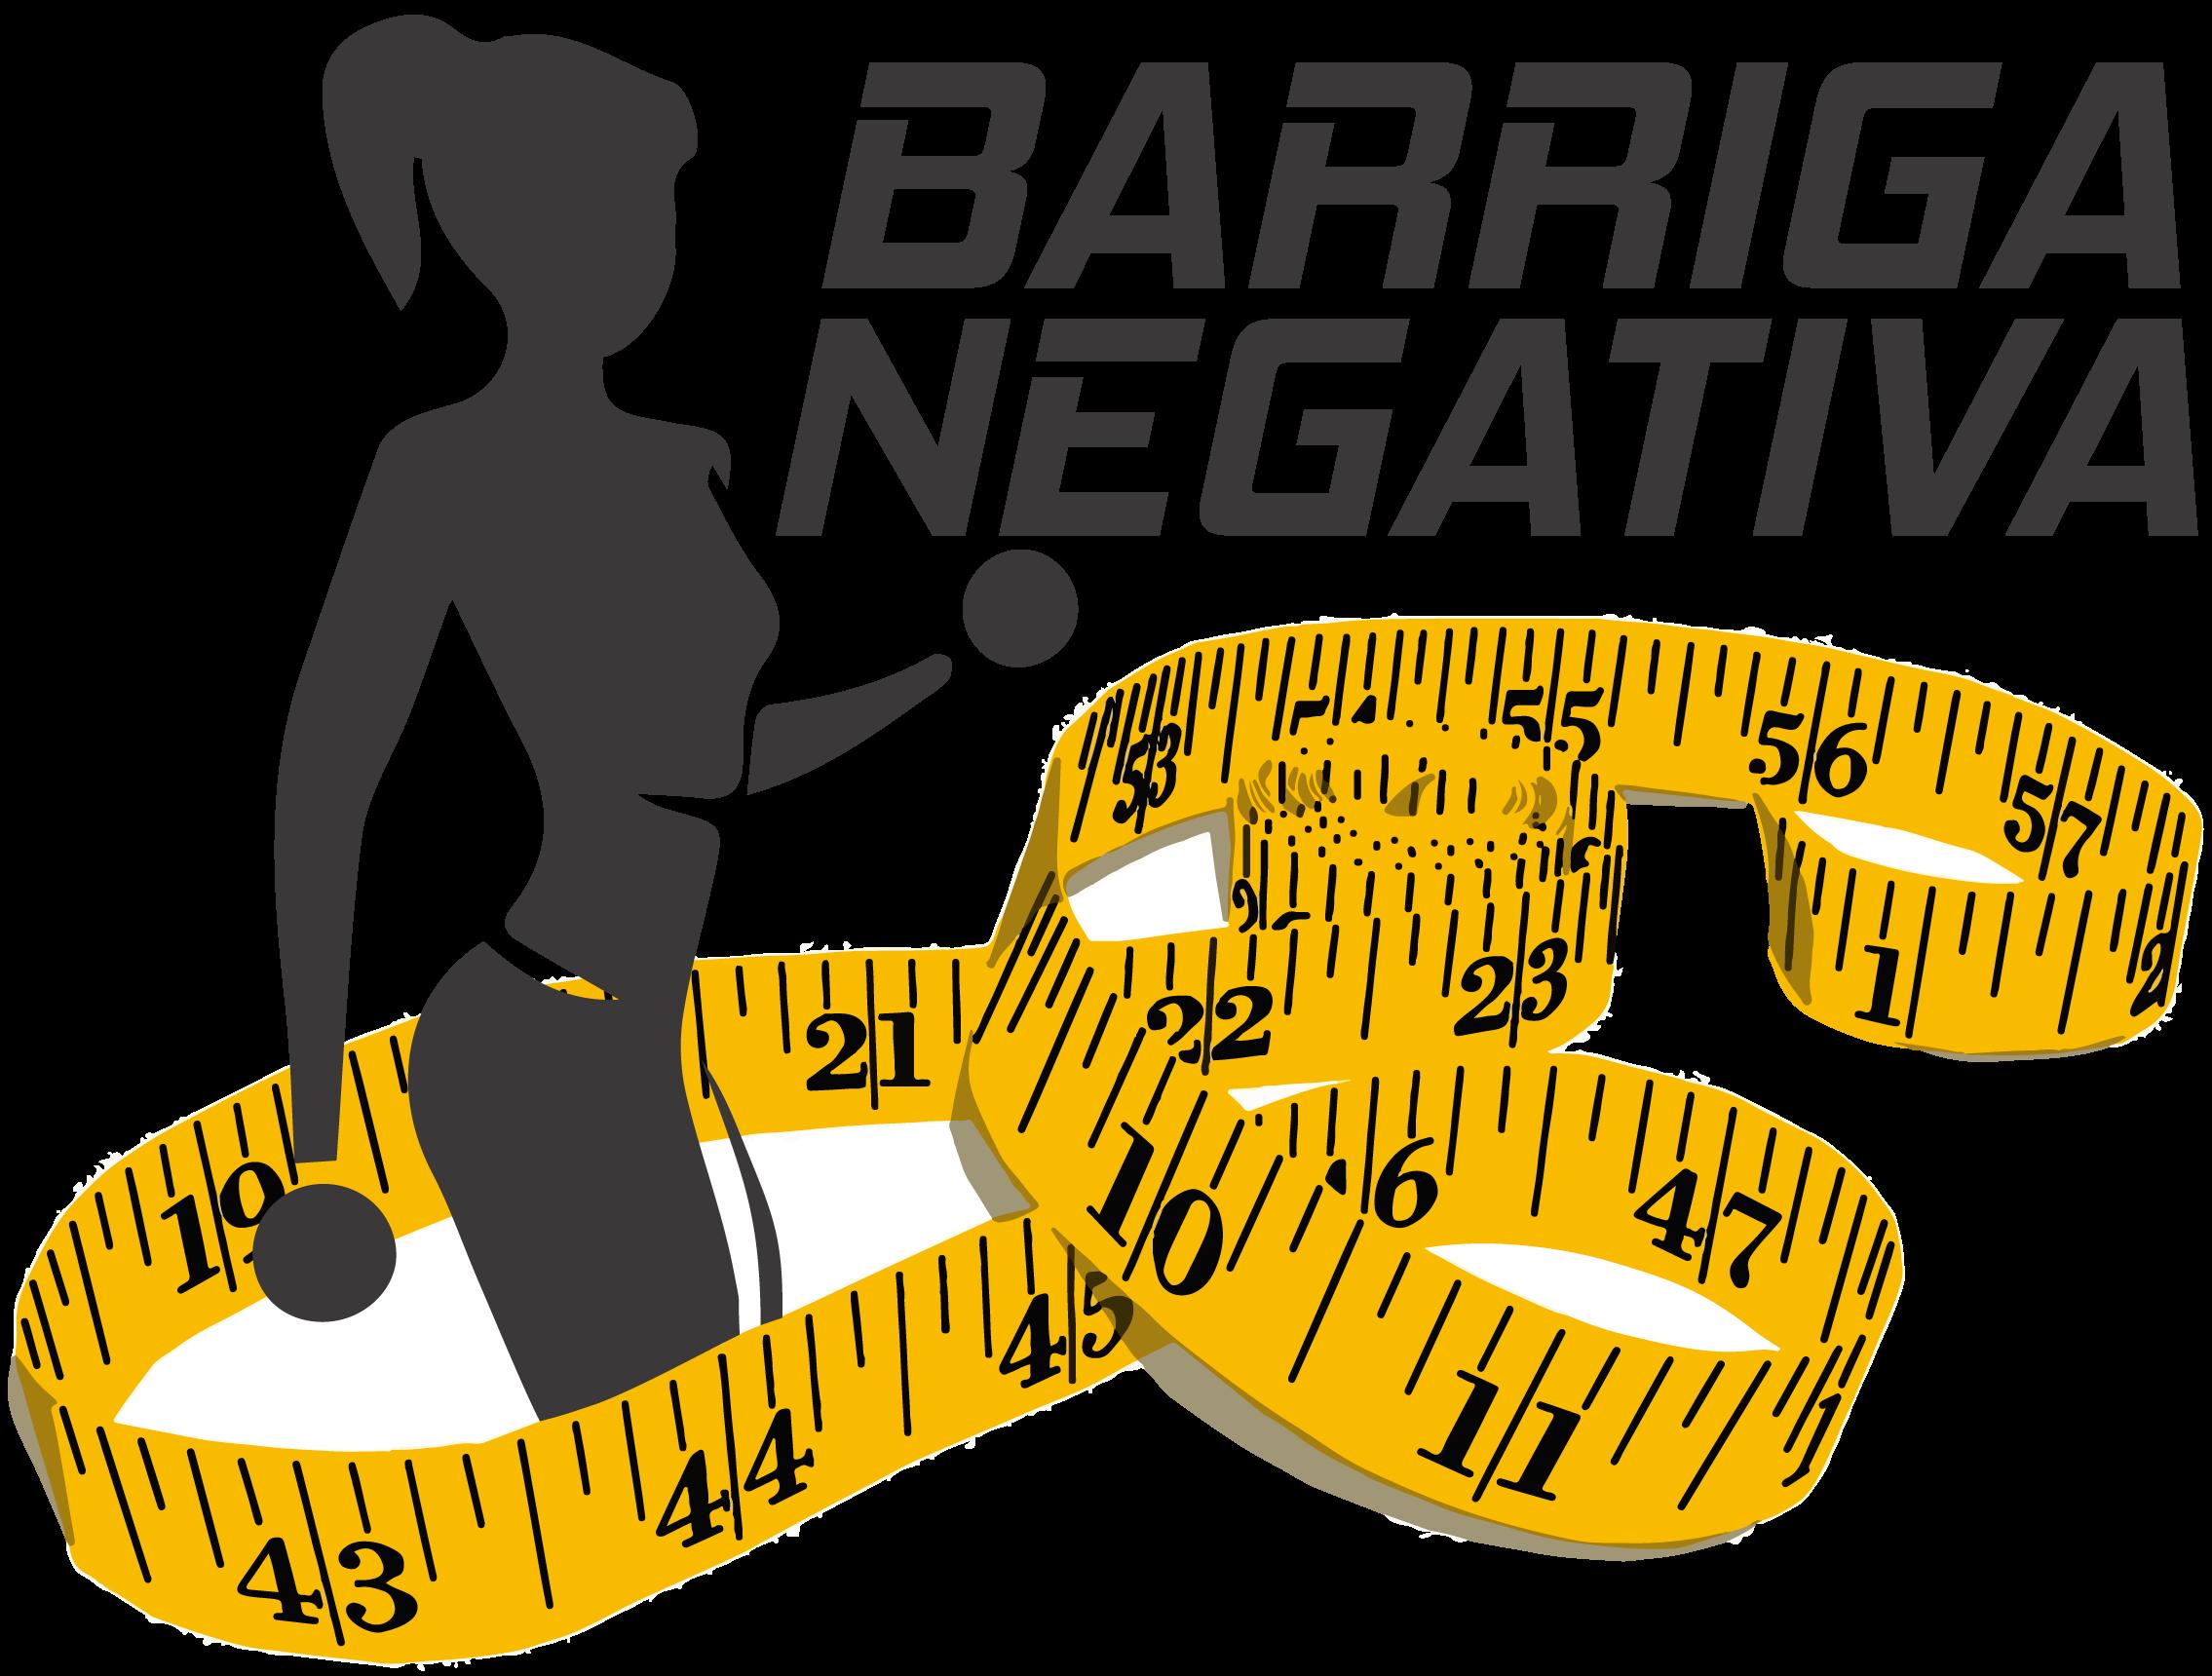 Programa Barriga Negativa